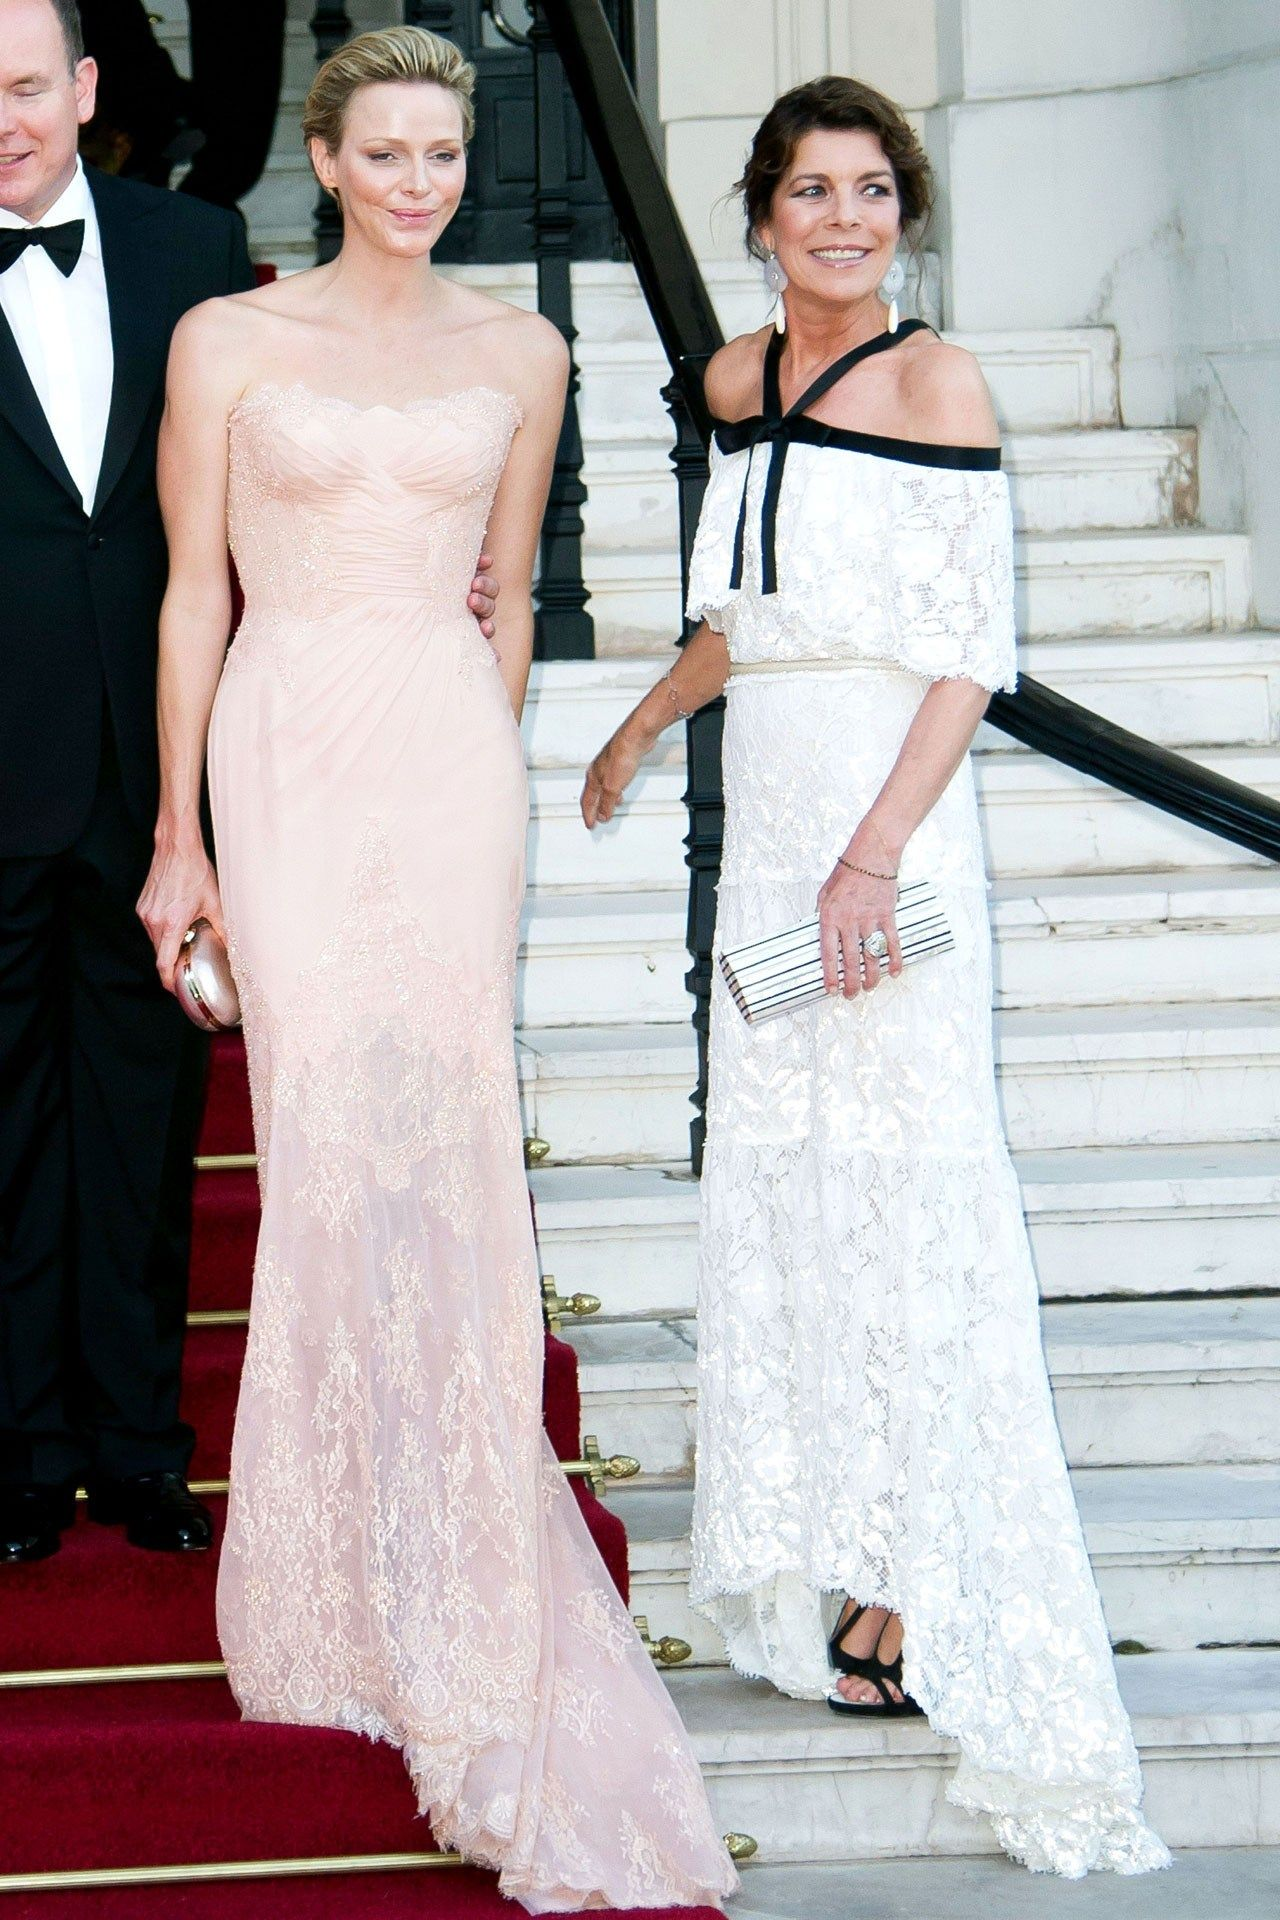 Wedding-Worthy Red Carpet Gowns | Versace gown, Princess caroline ...